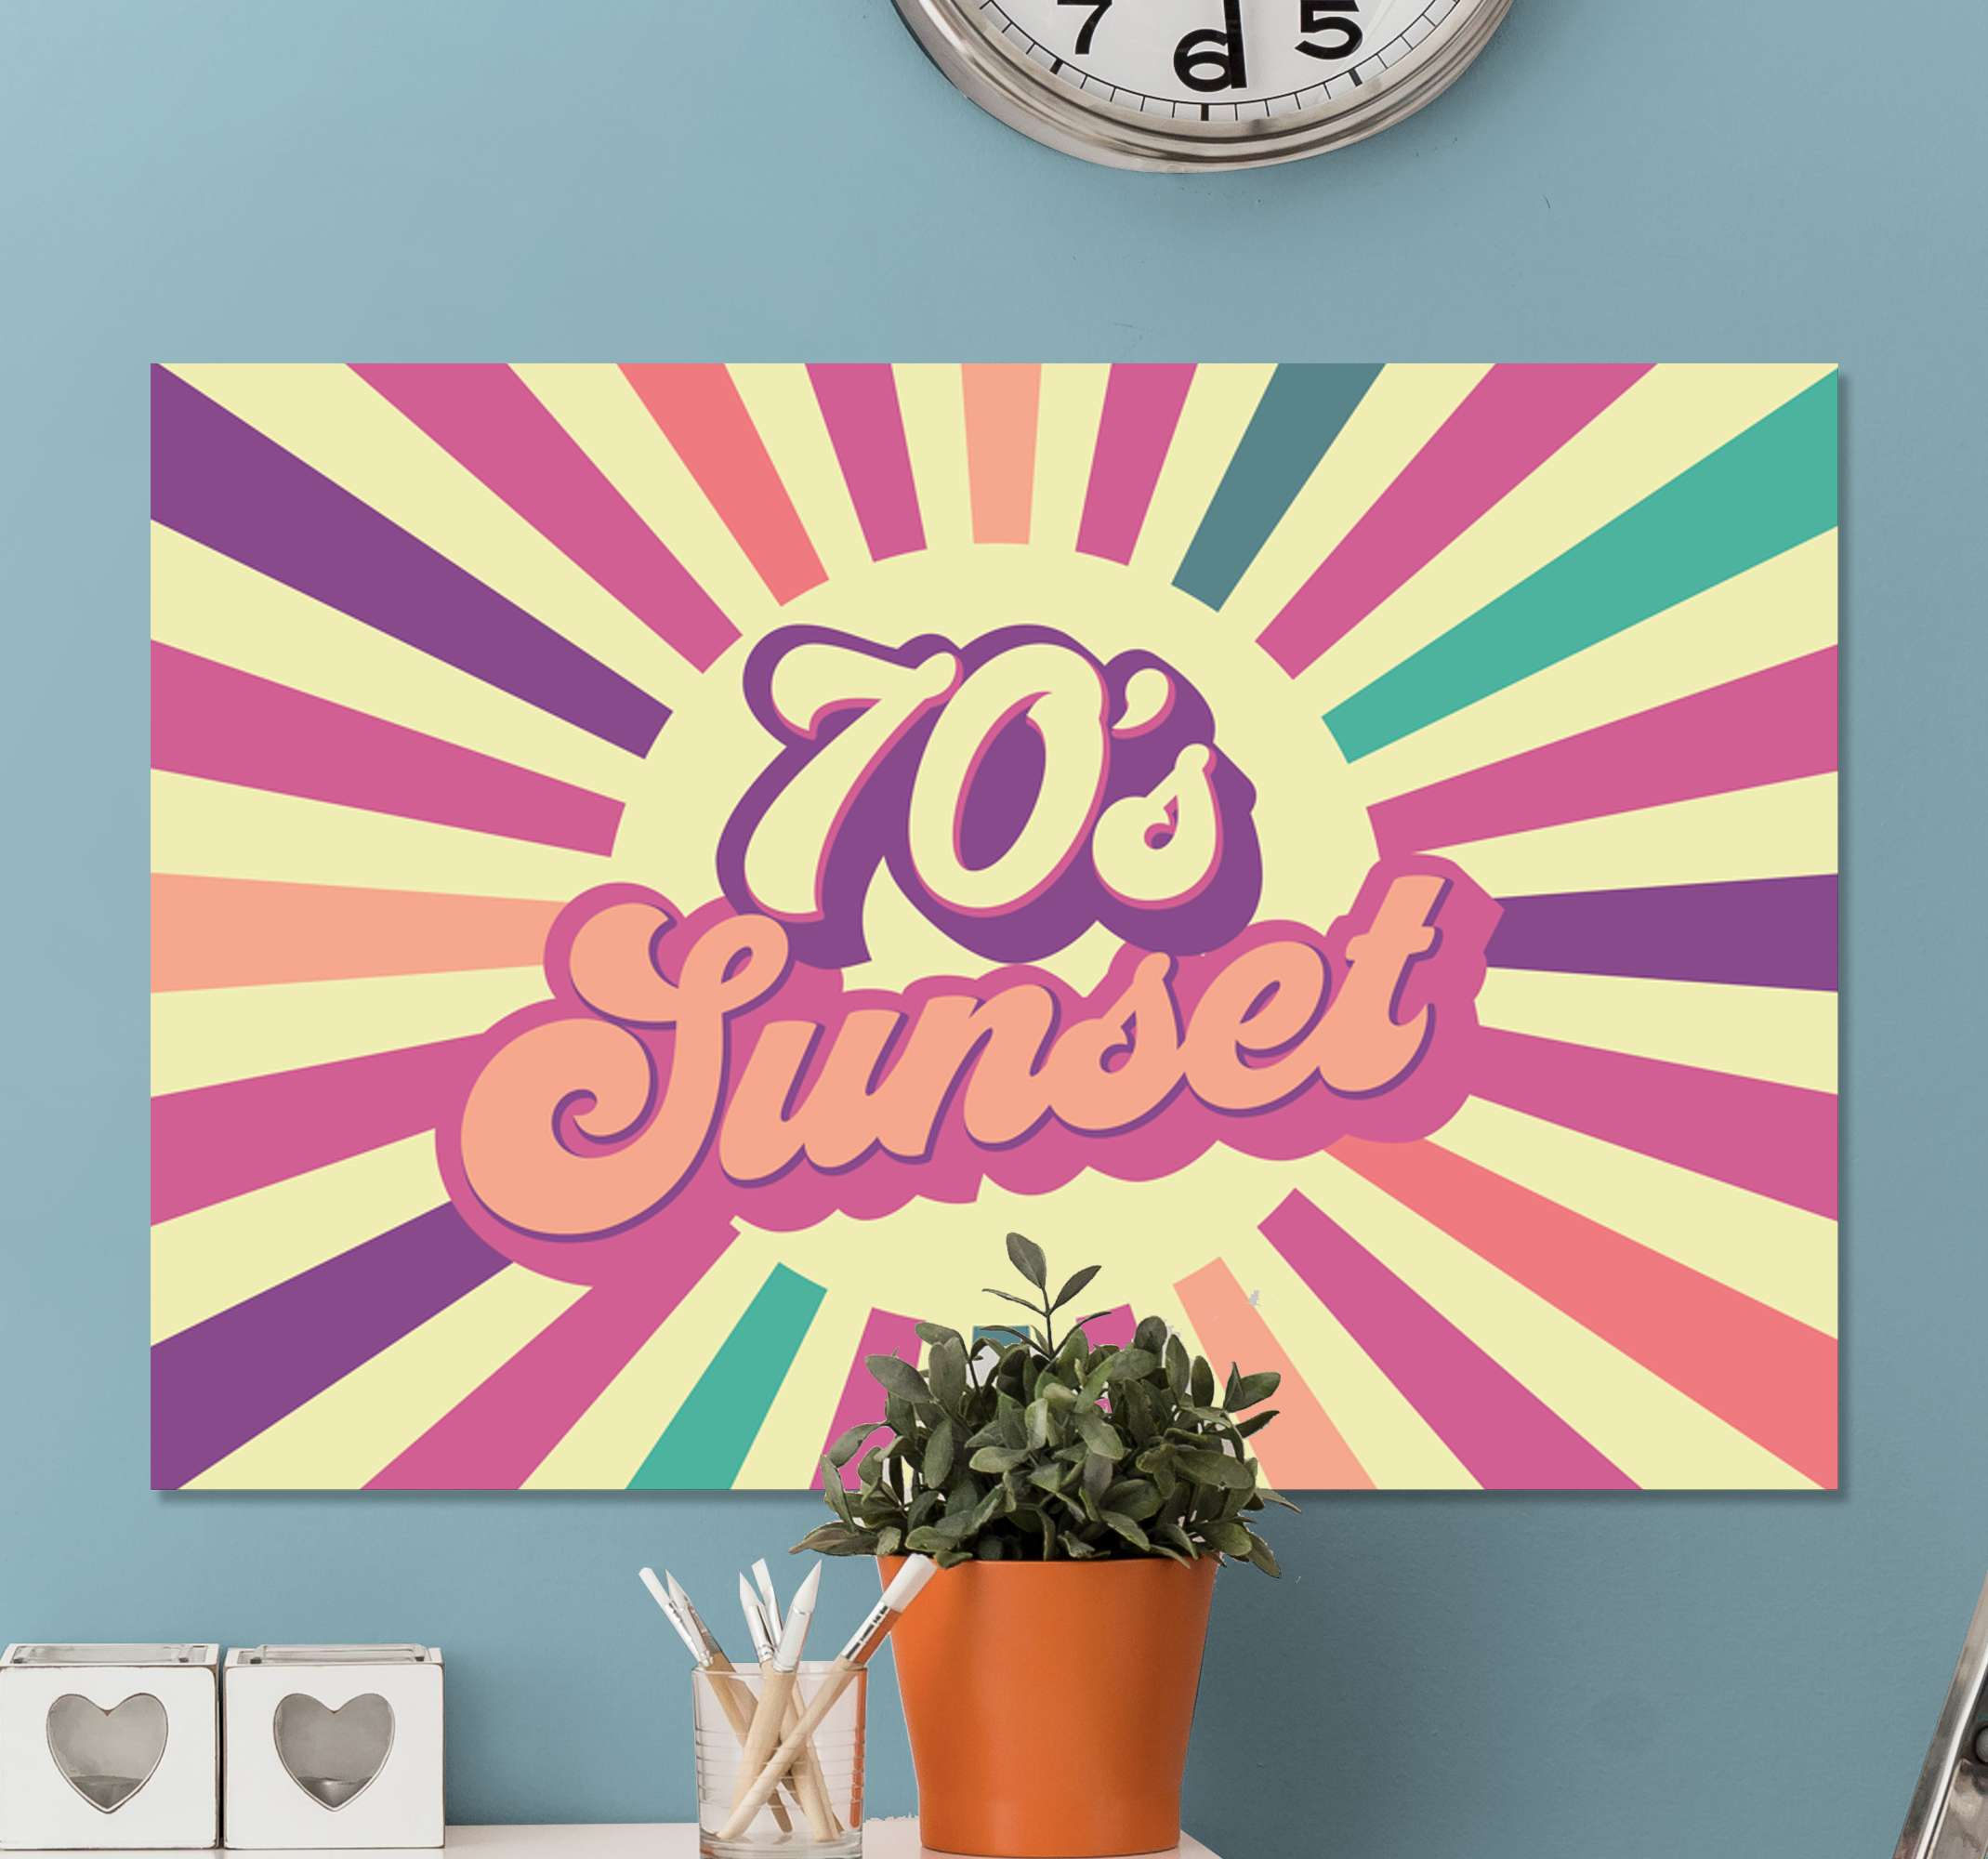 TenStickers. 70年代几何阳光帆布墙艺术. 用我们原始的70年代几何阳光帆布印花为您营造一个宁静而舒缓的氛围。它是原始且耐用的。